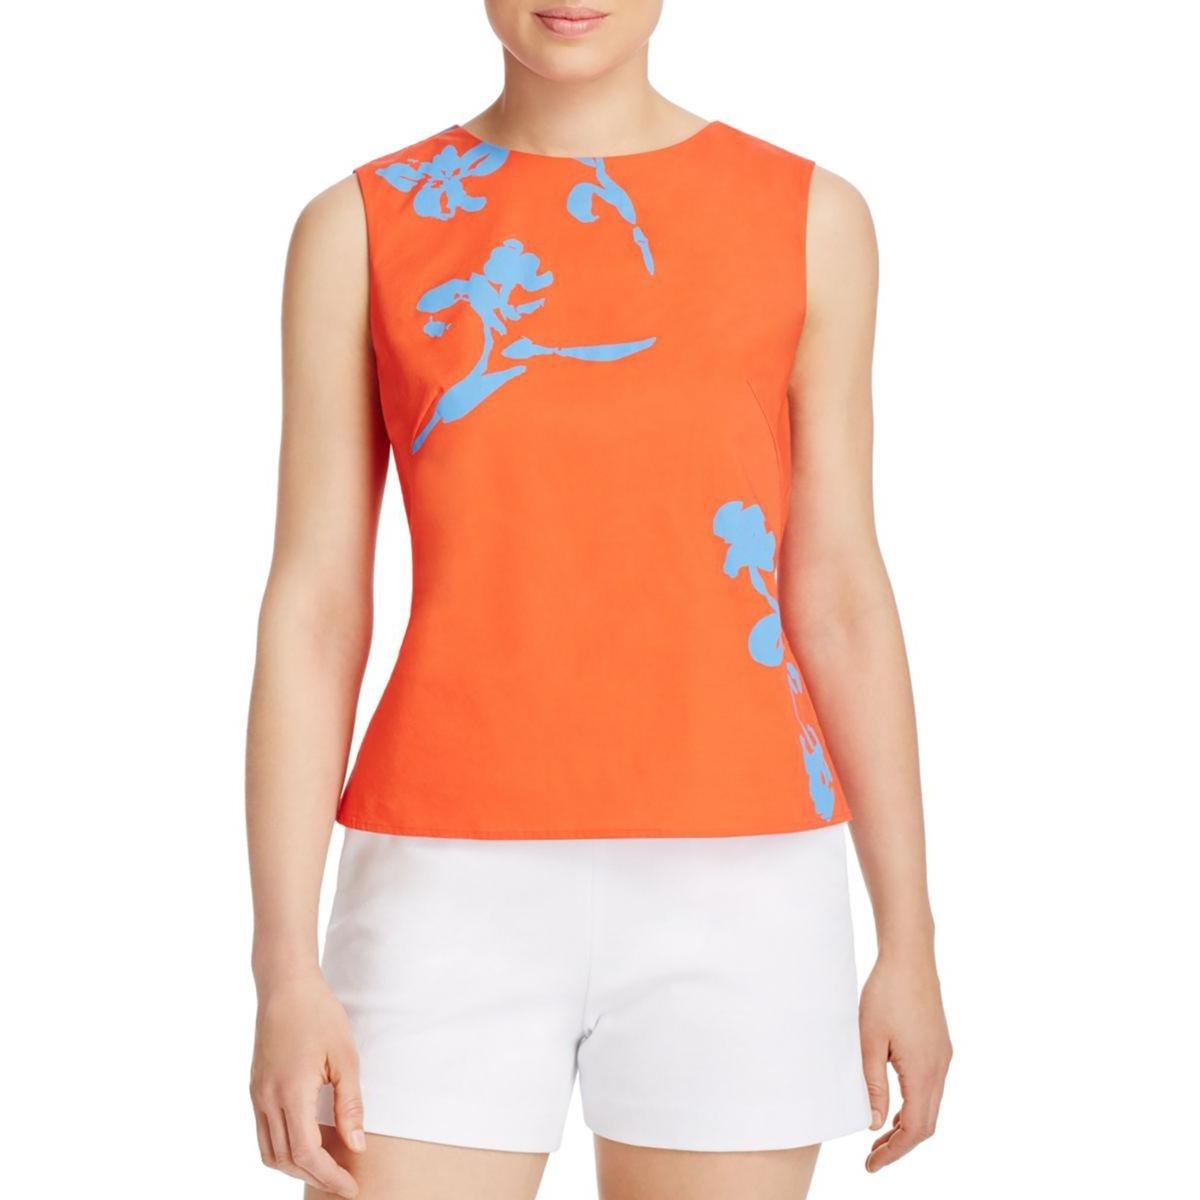 Tory Burch Womens Cotton Blend Printed Shell Orange 6